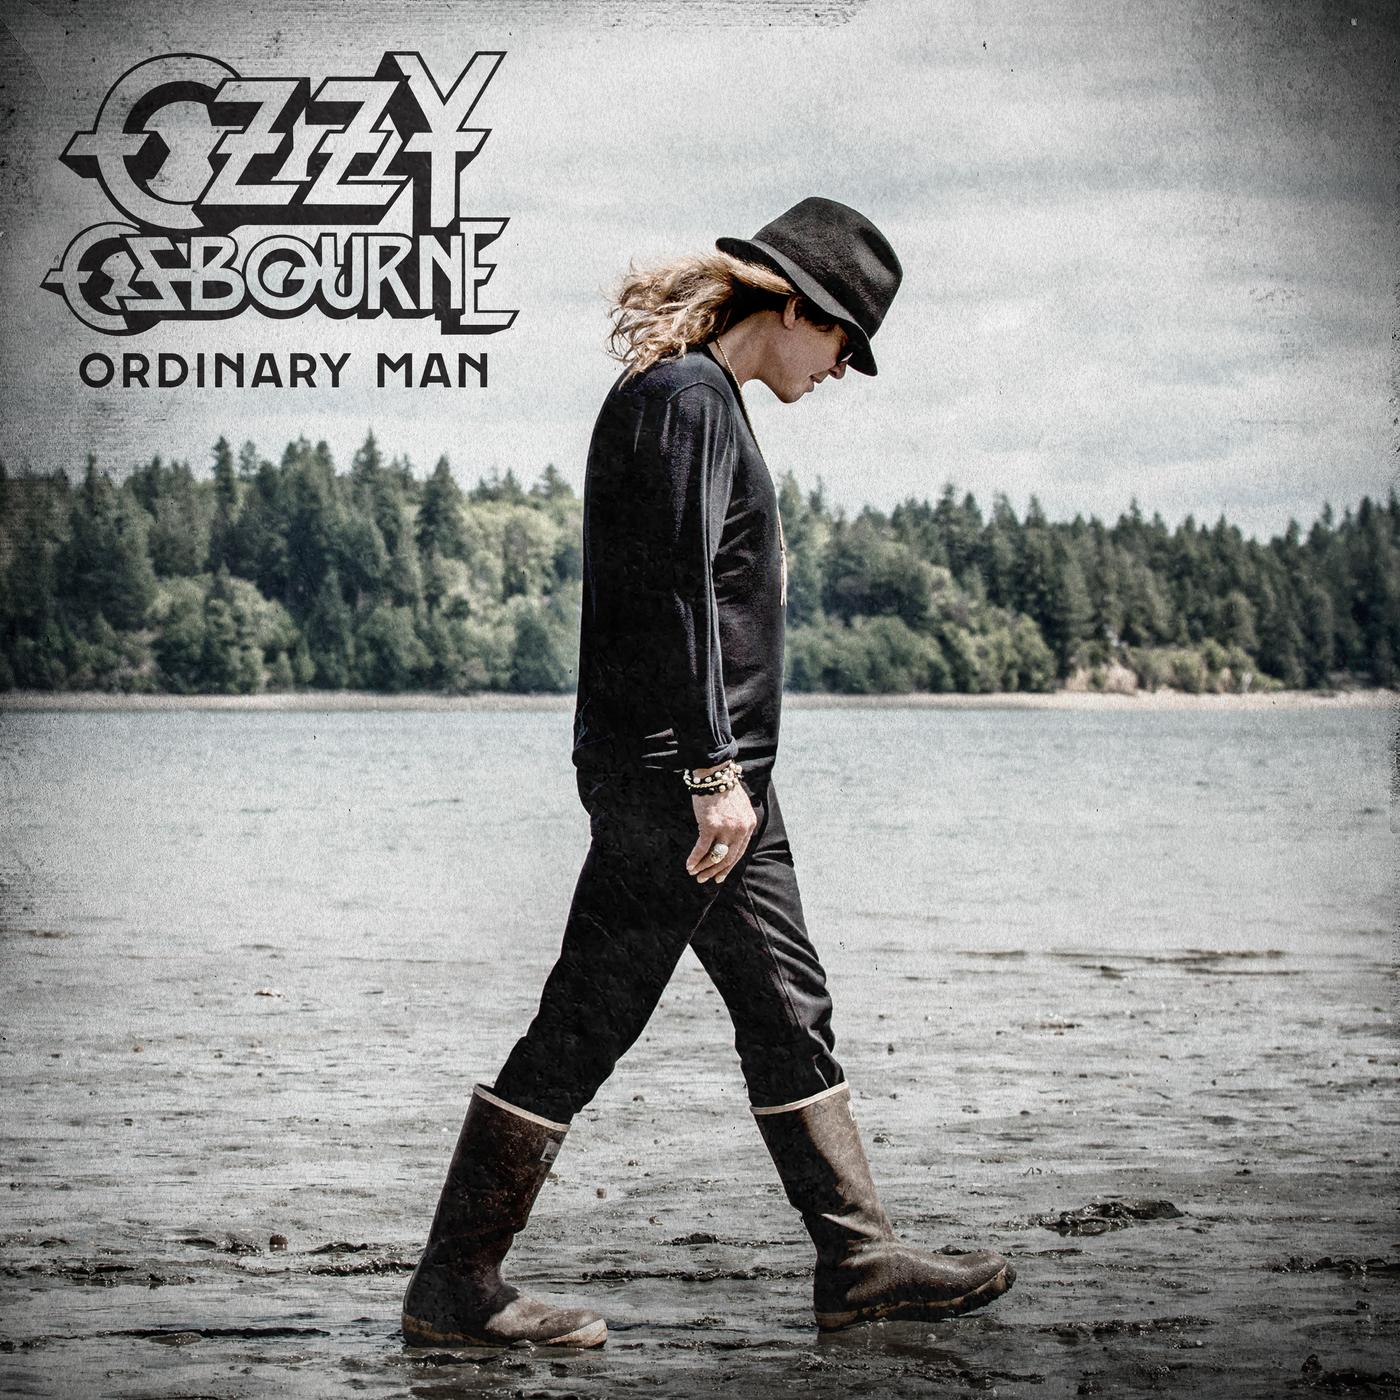 Ordinary Man - Ozzy Osbourne